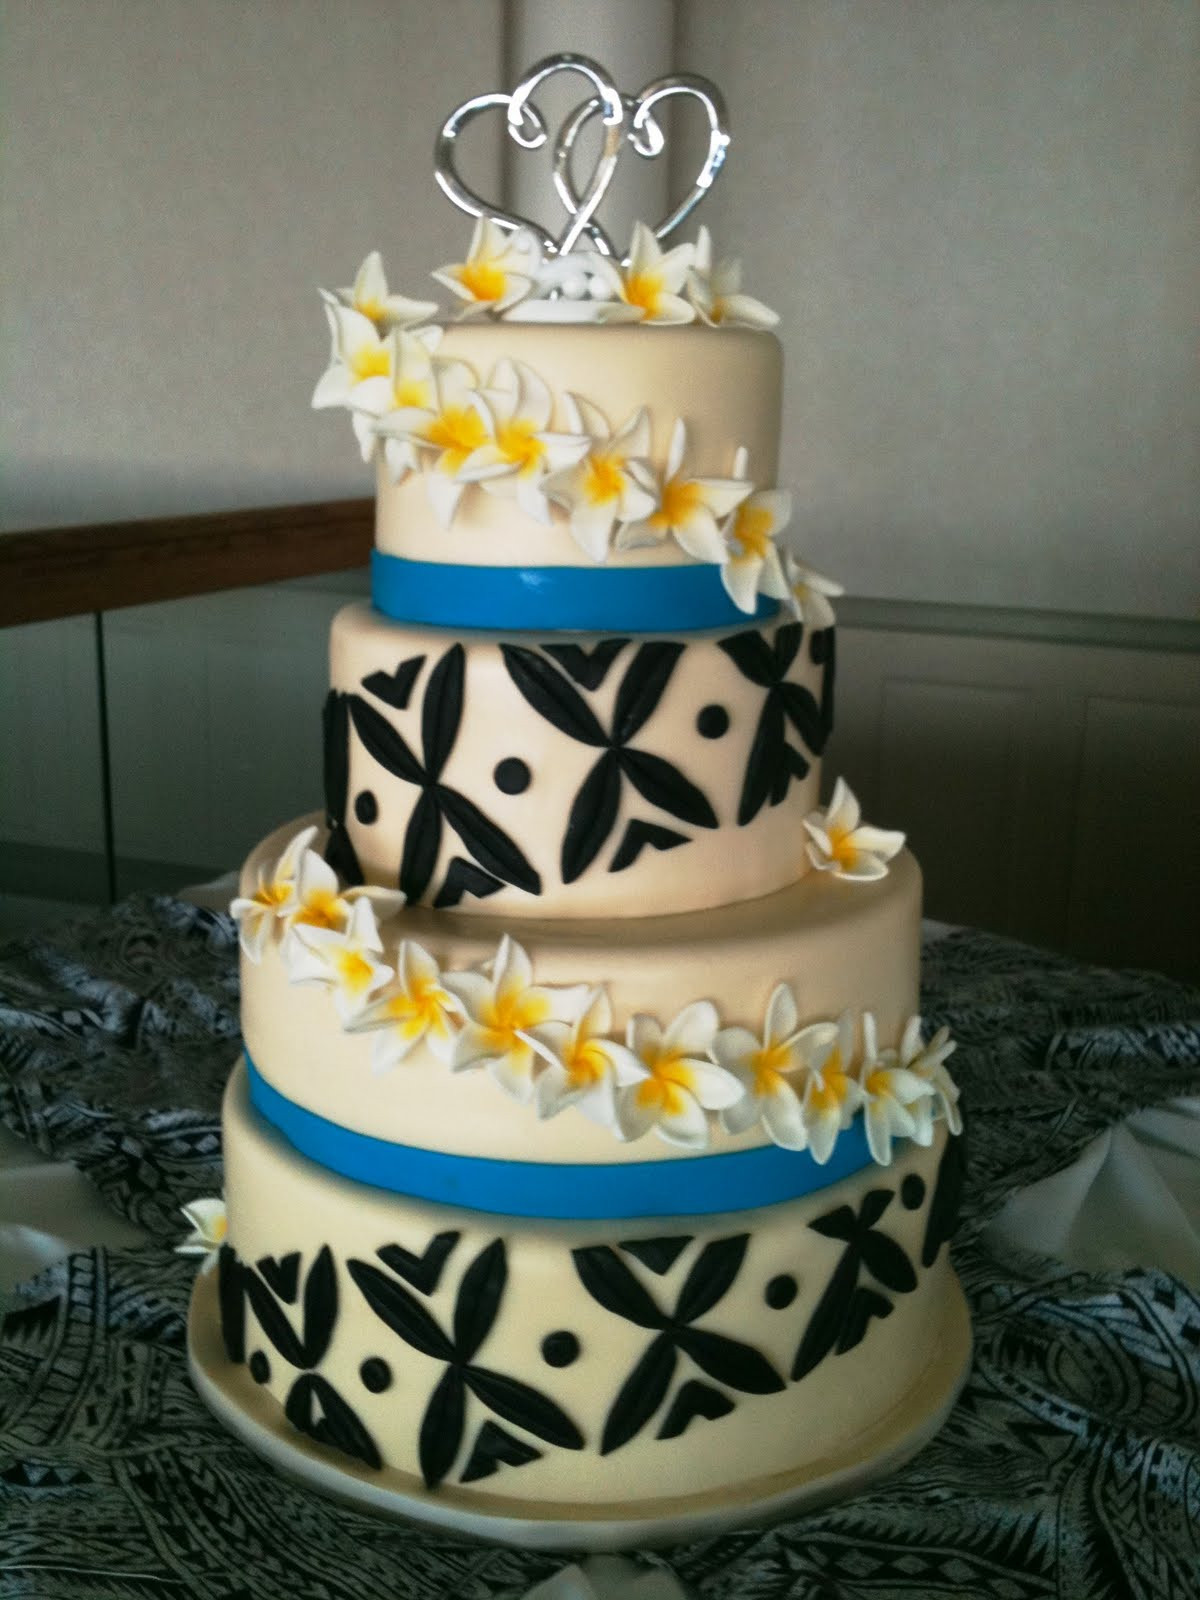 Flour Girl Wedding Cakes  Flour Girl Designs Non Traditional Wedding Cakes Awesome